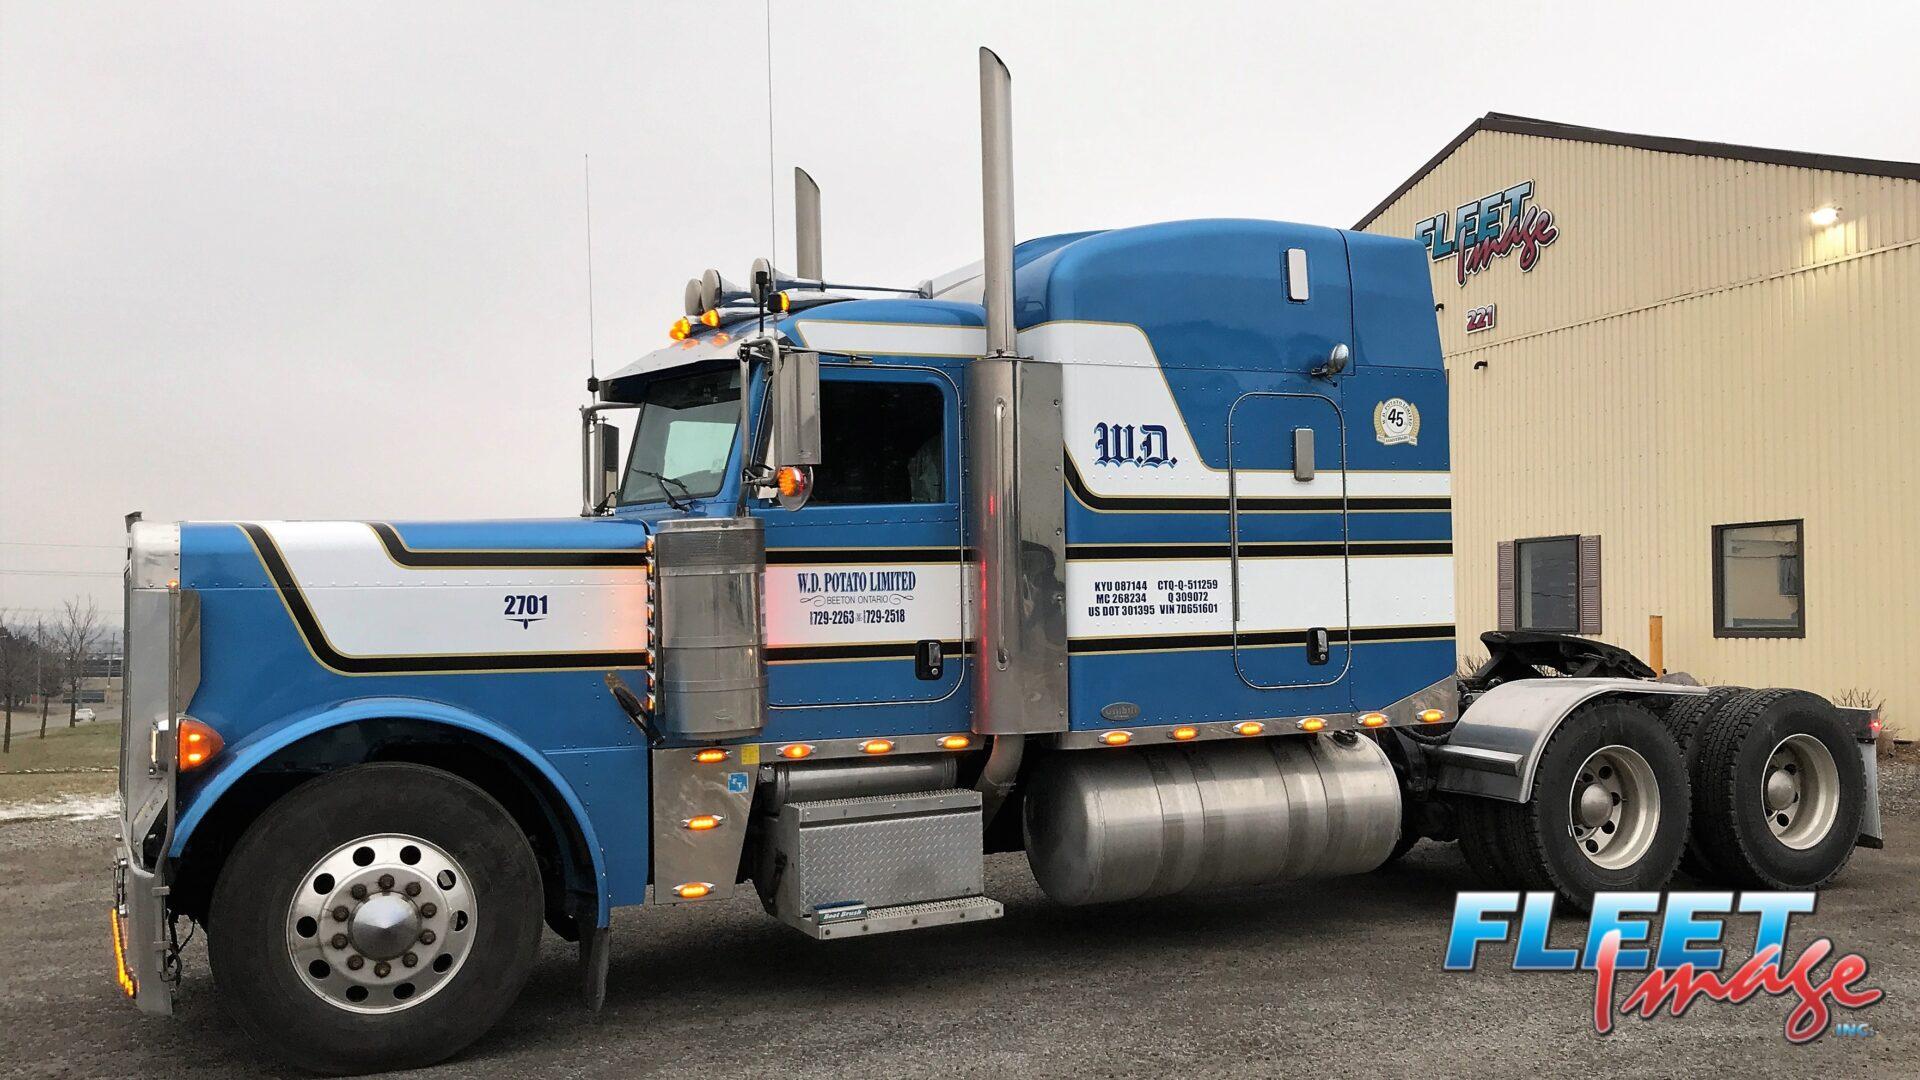 W.D. Potato Limited blue truck